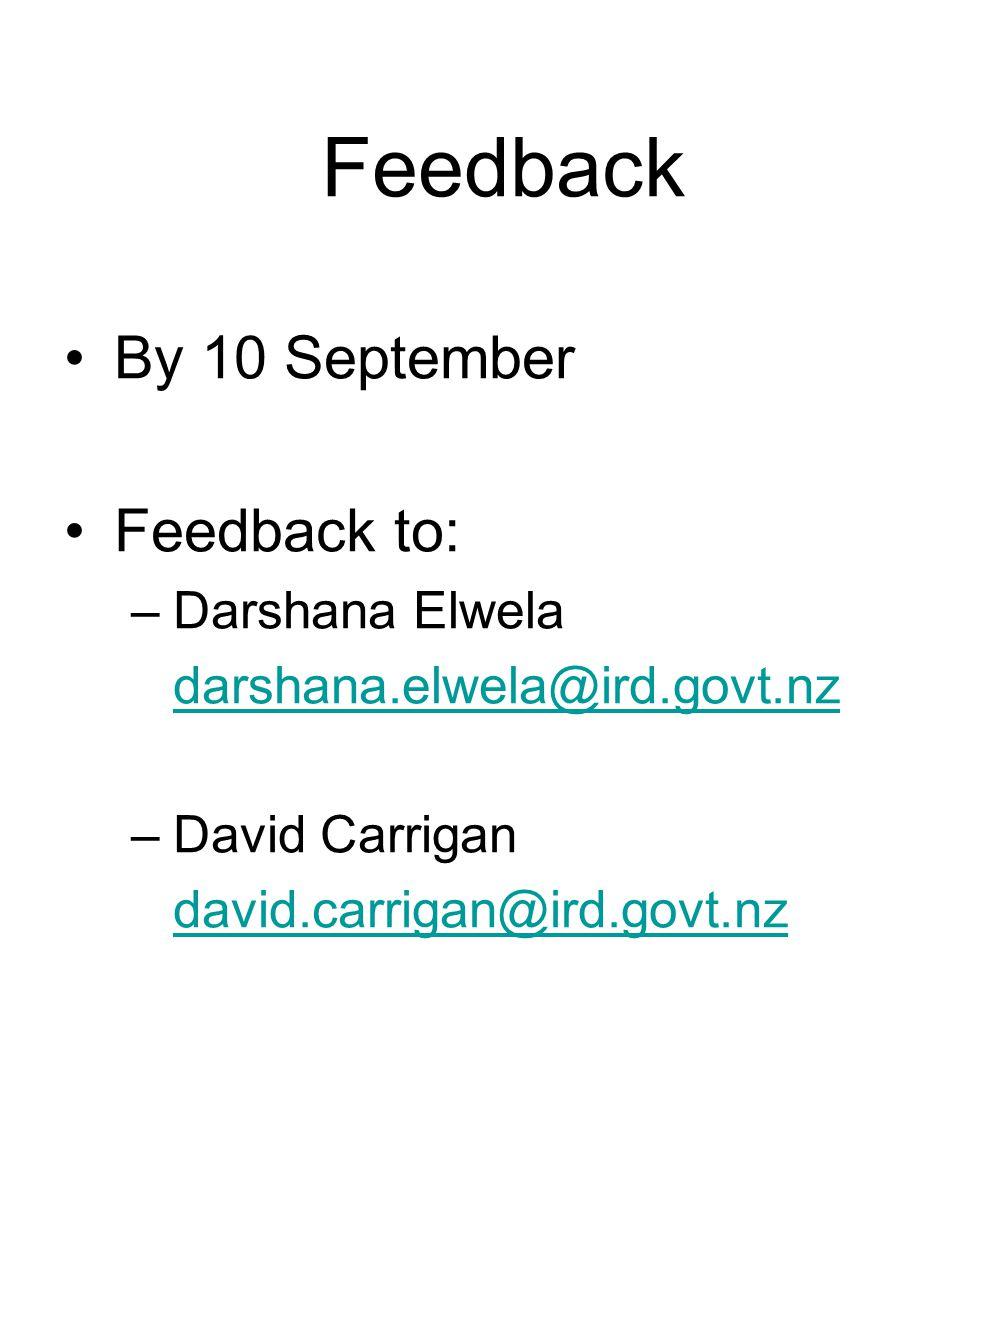 Feedback By 10 September Feedback to: –Darshana Elwela darshana.elwela@ird.govt.nz –David Carrigan david.carrigan@ird.govt.nz